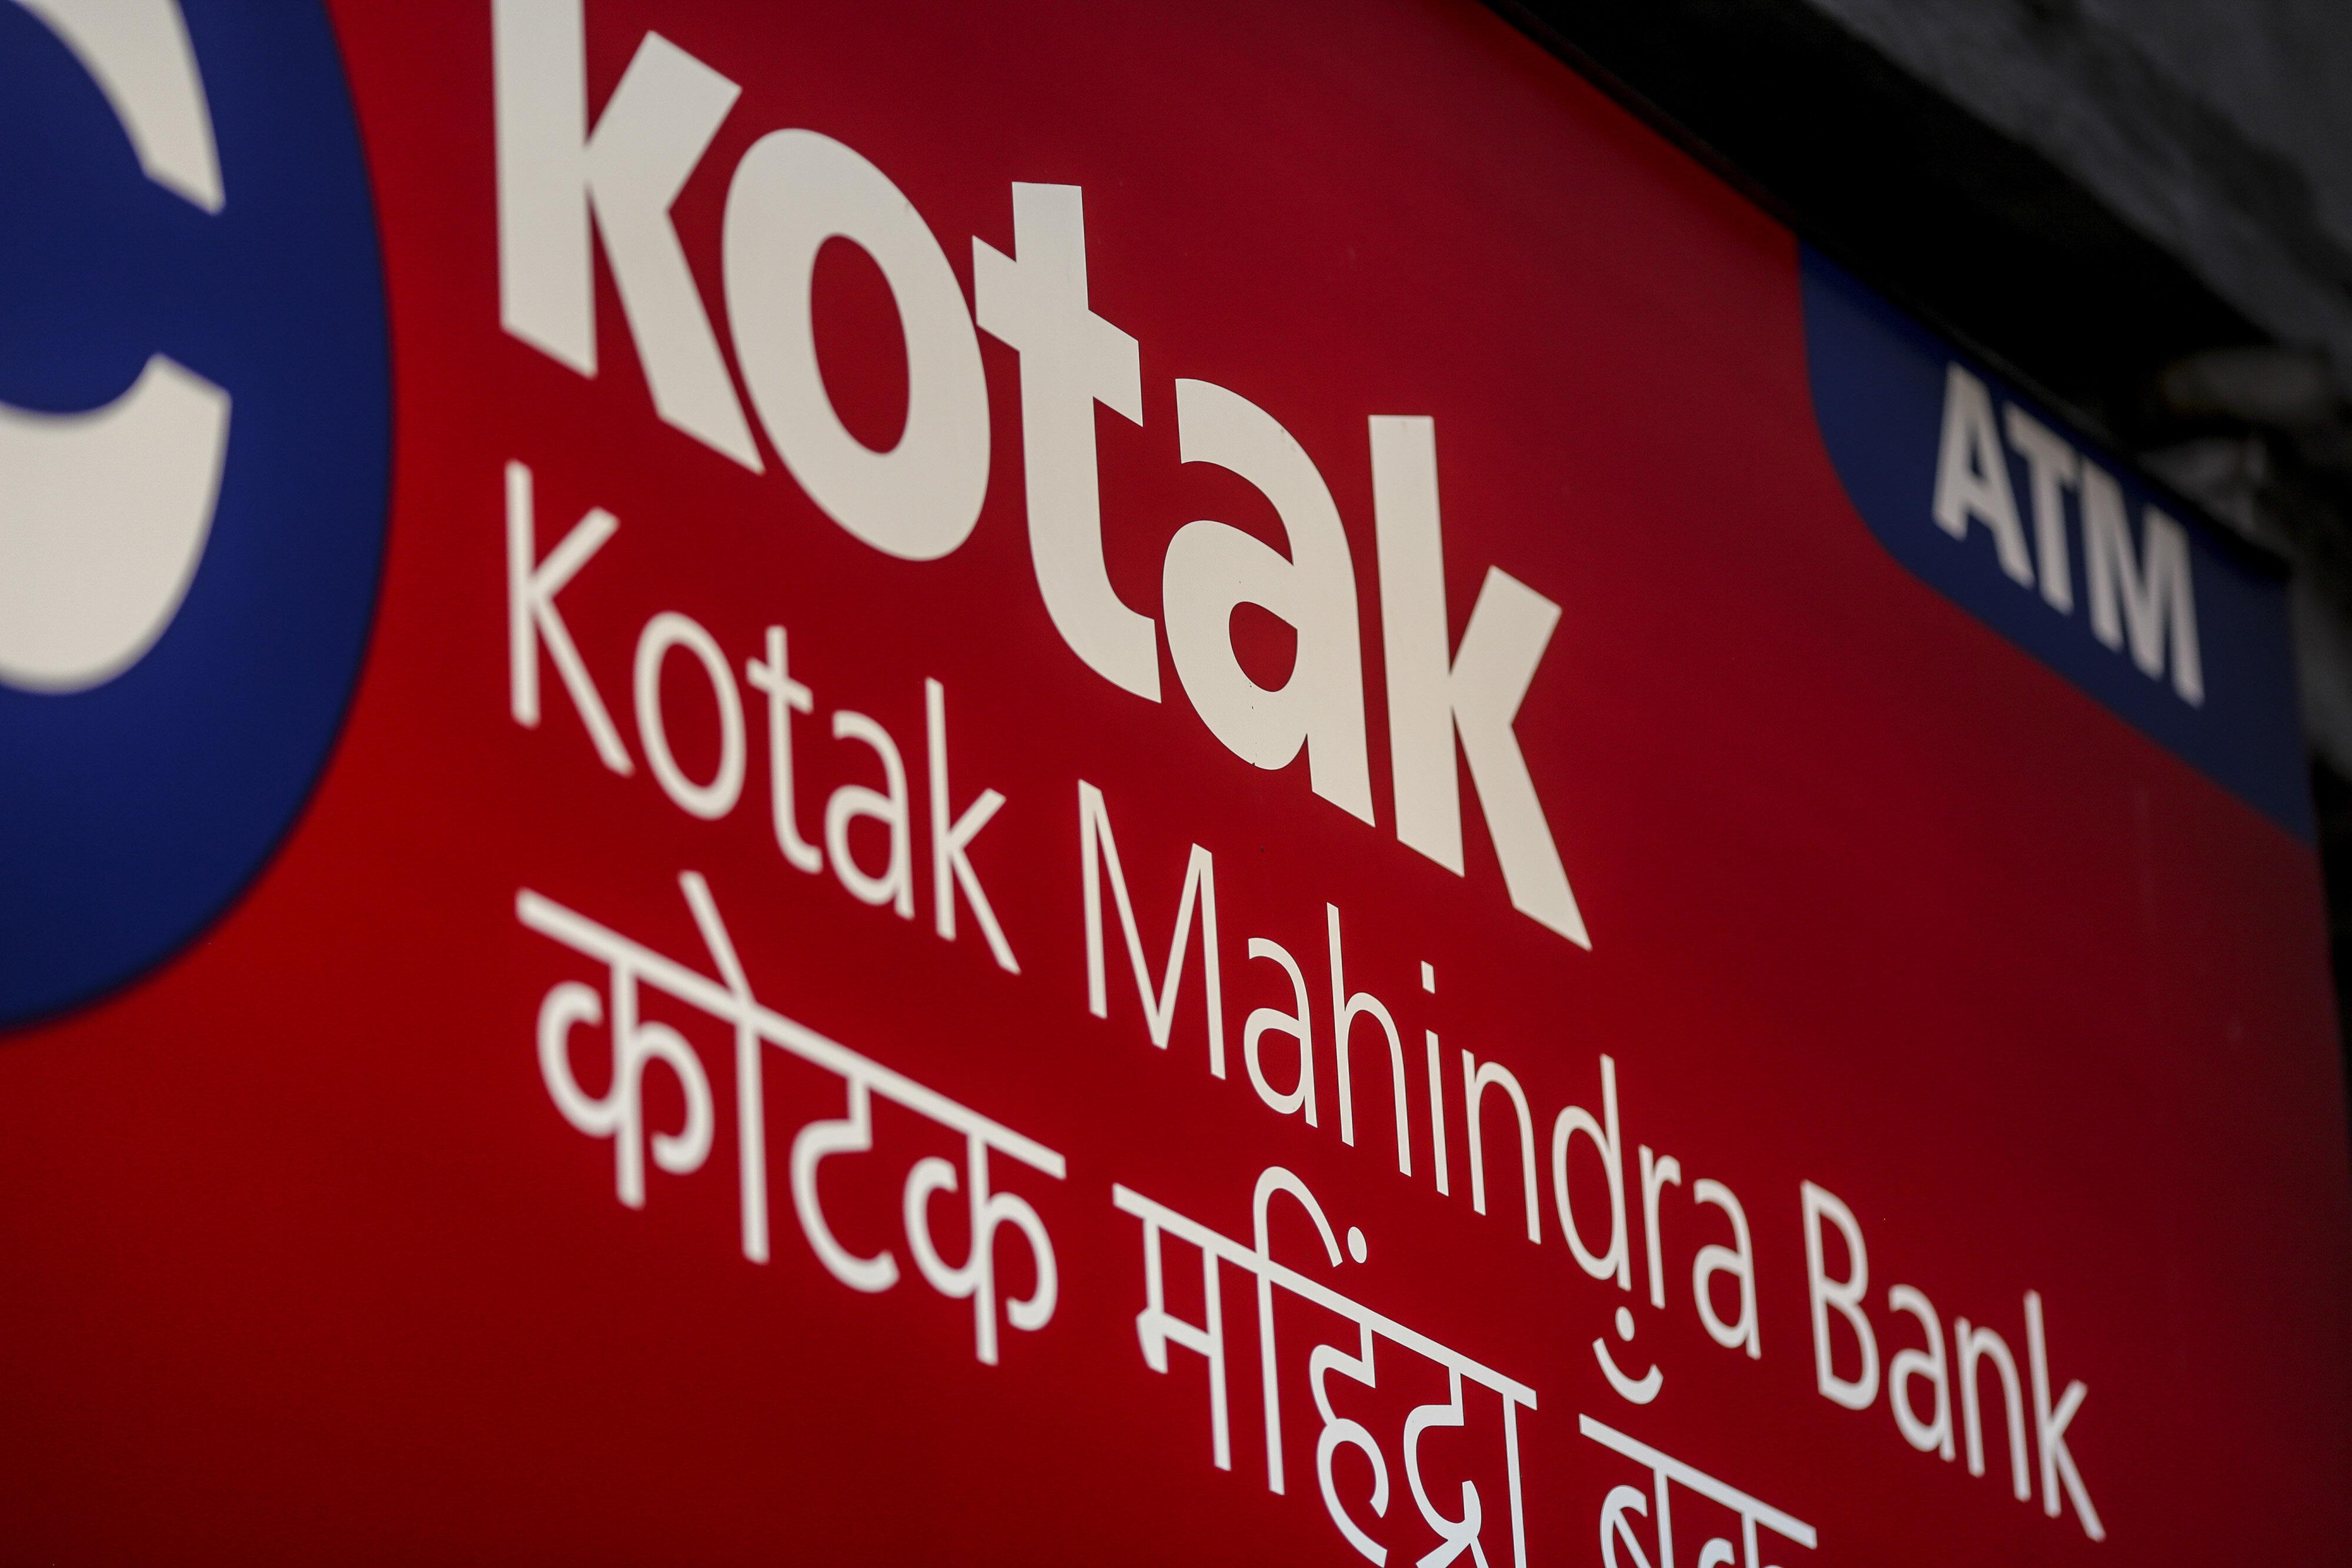 Wilful Mala Fide Rbi S Scathing Language Has Kotak Mahindra Bank In Trouble Huffpost India